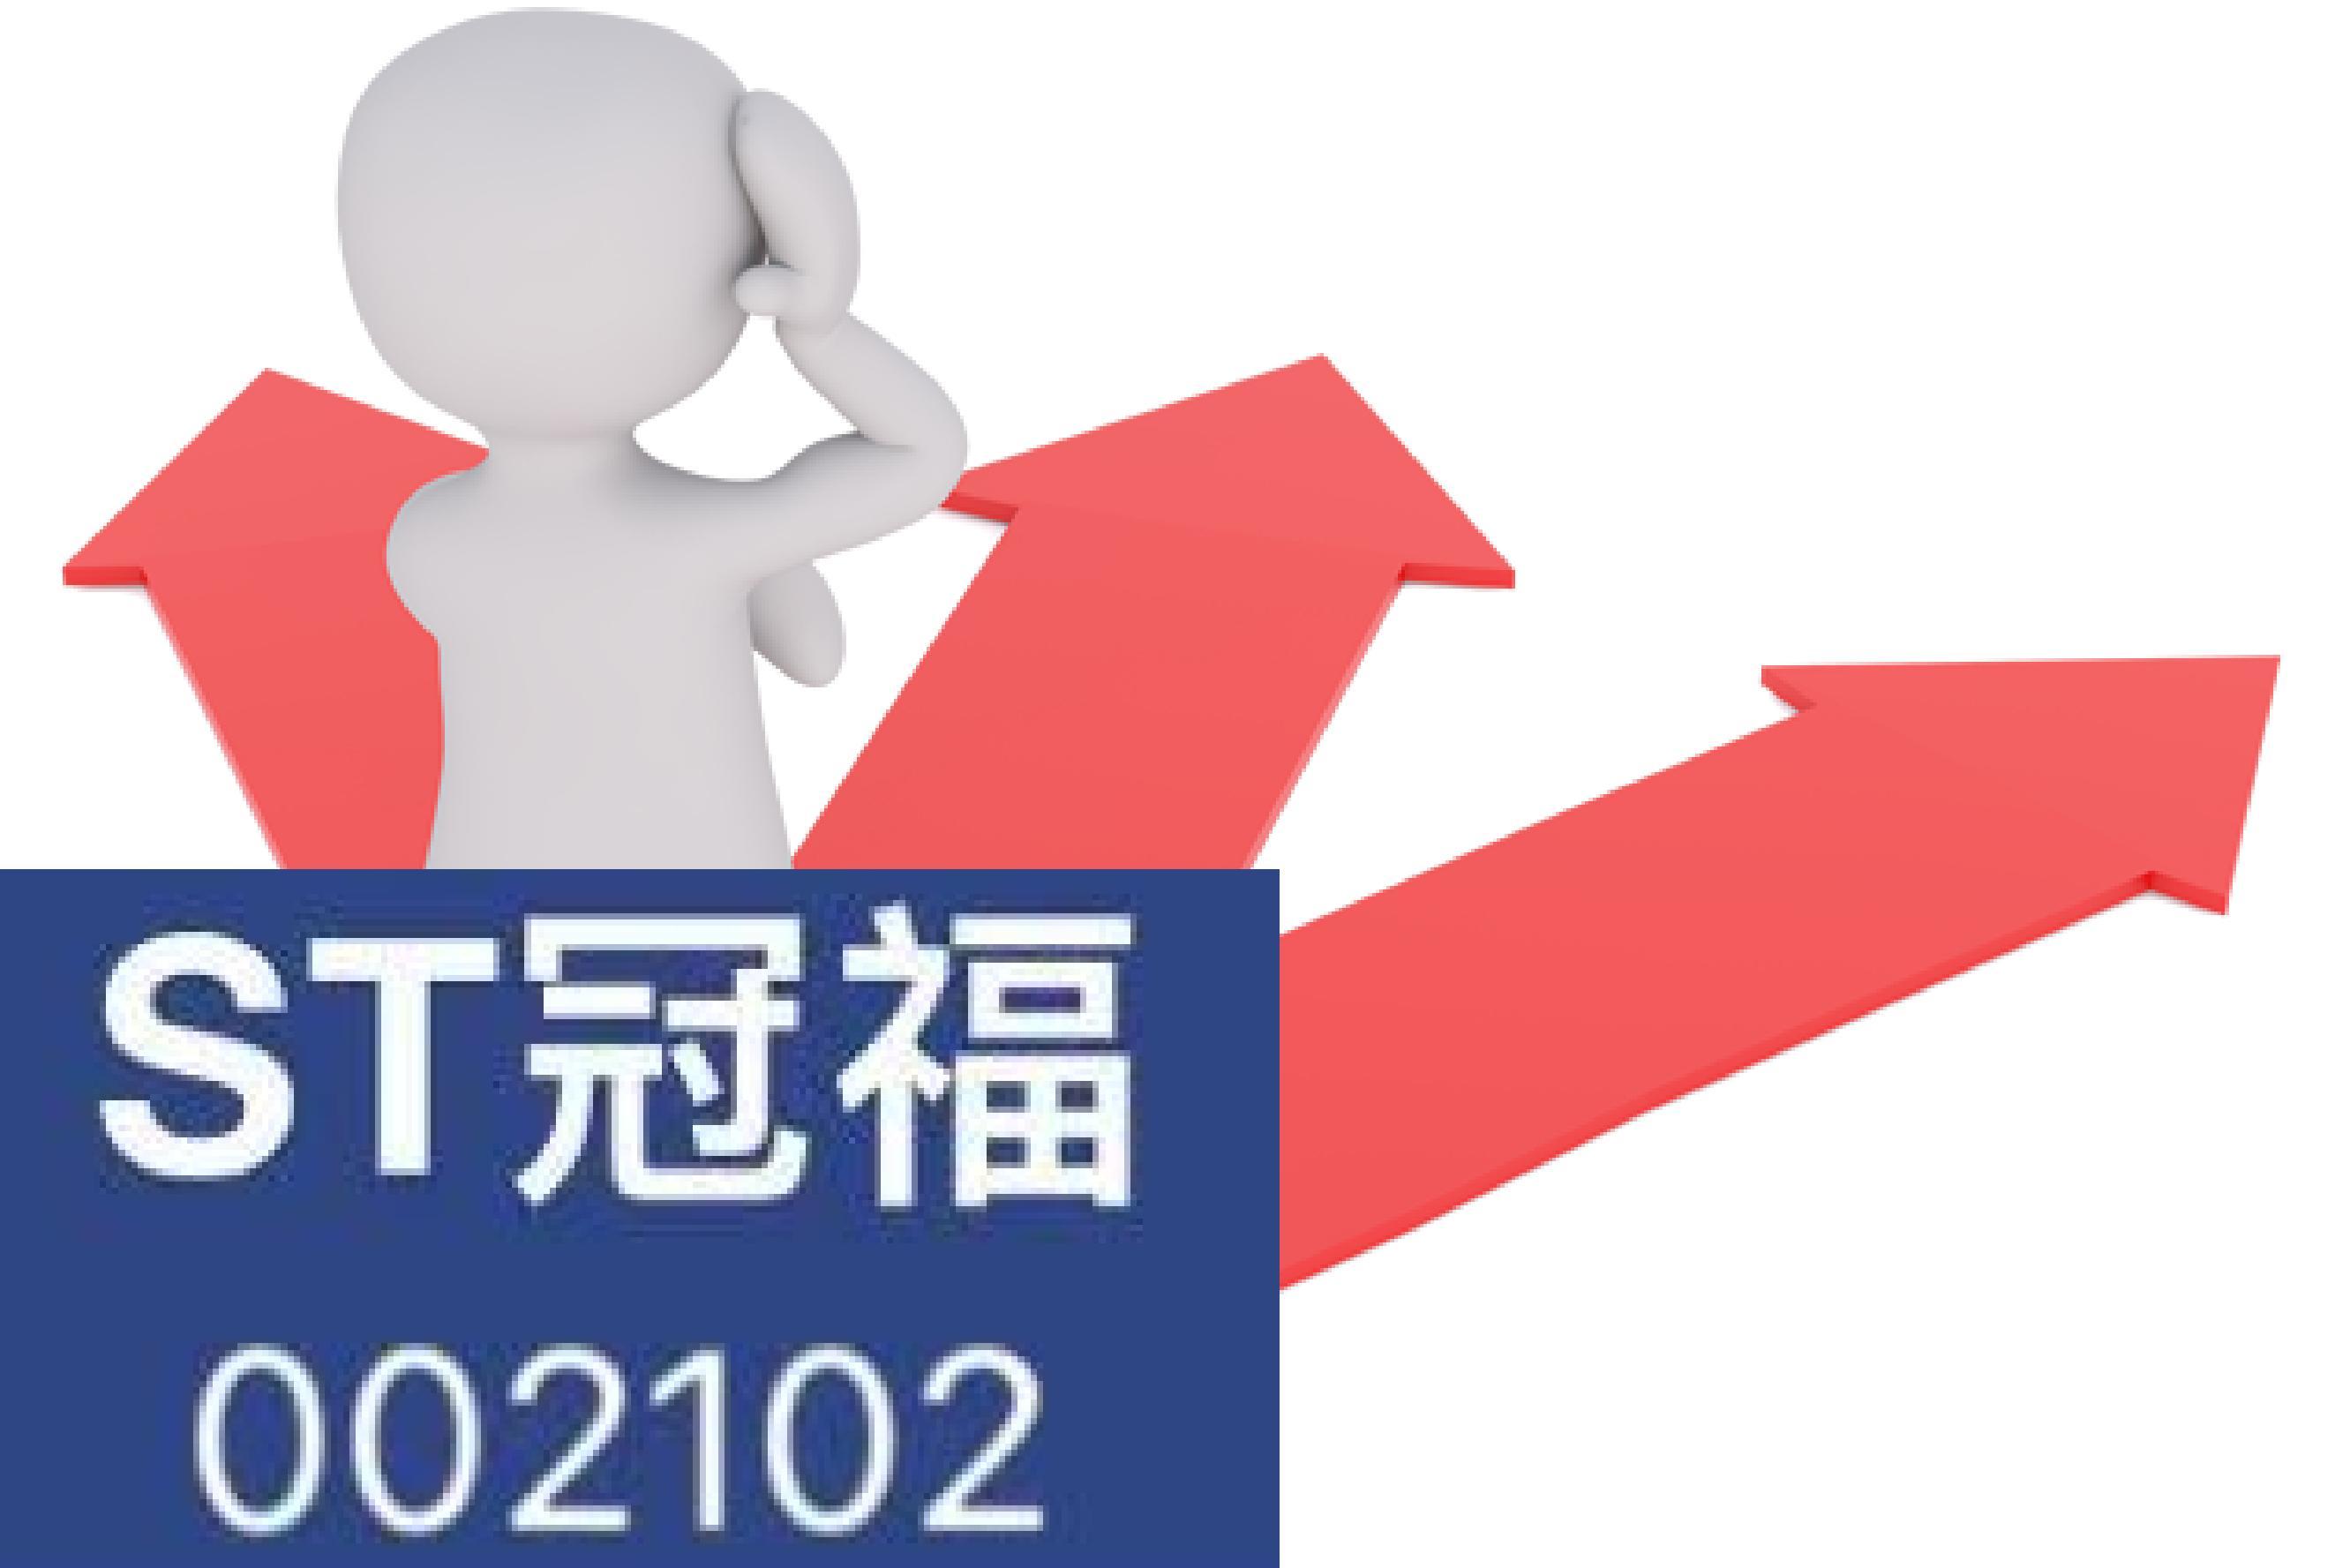 002102_ST冠福